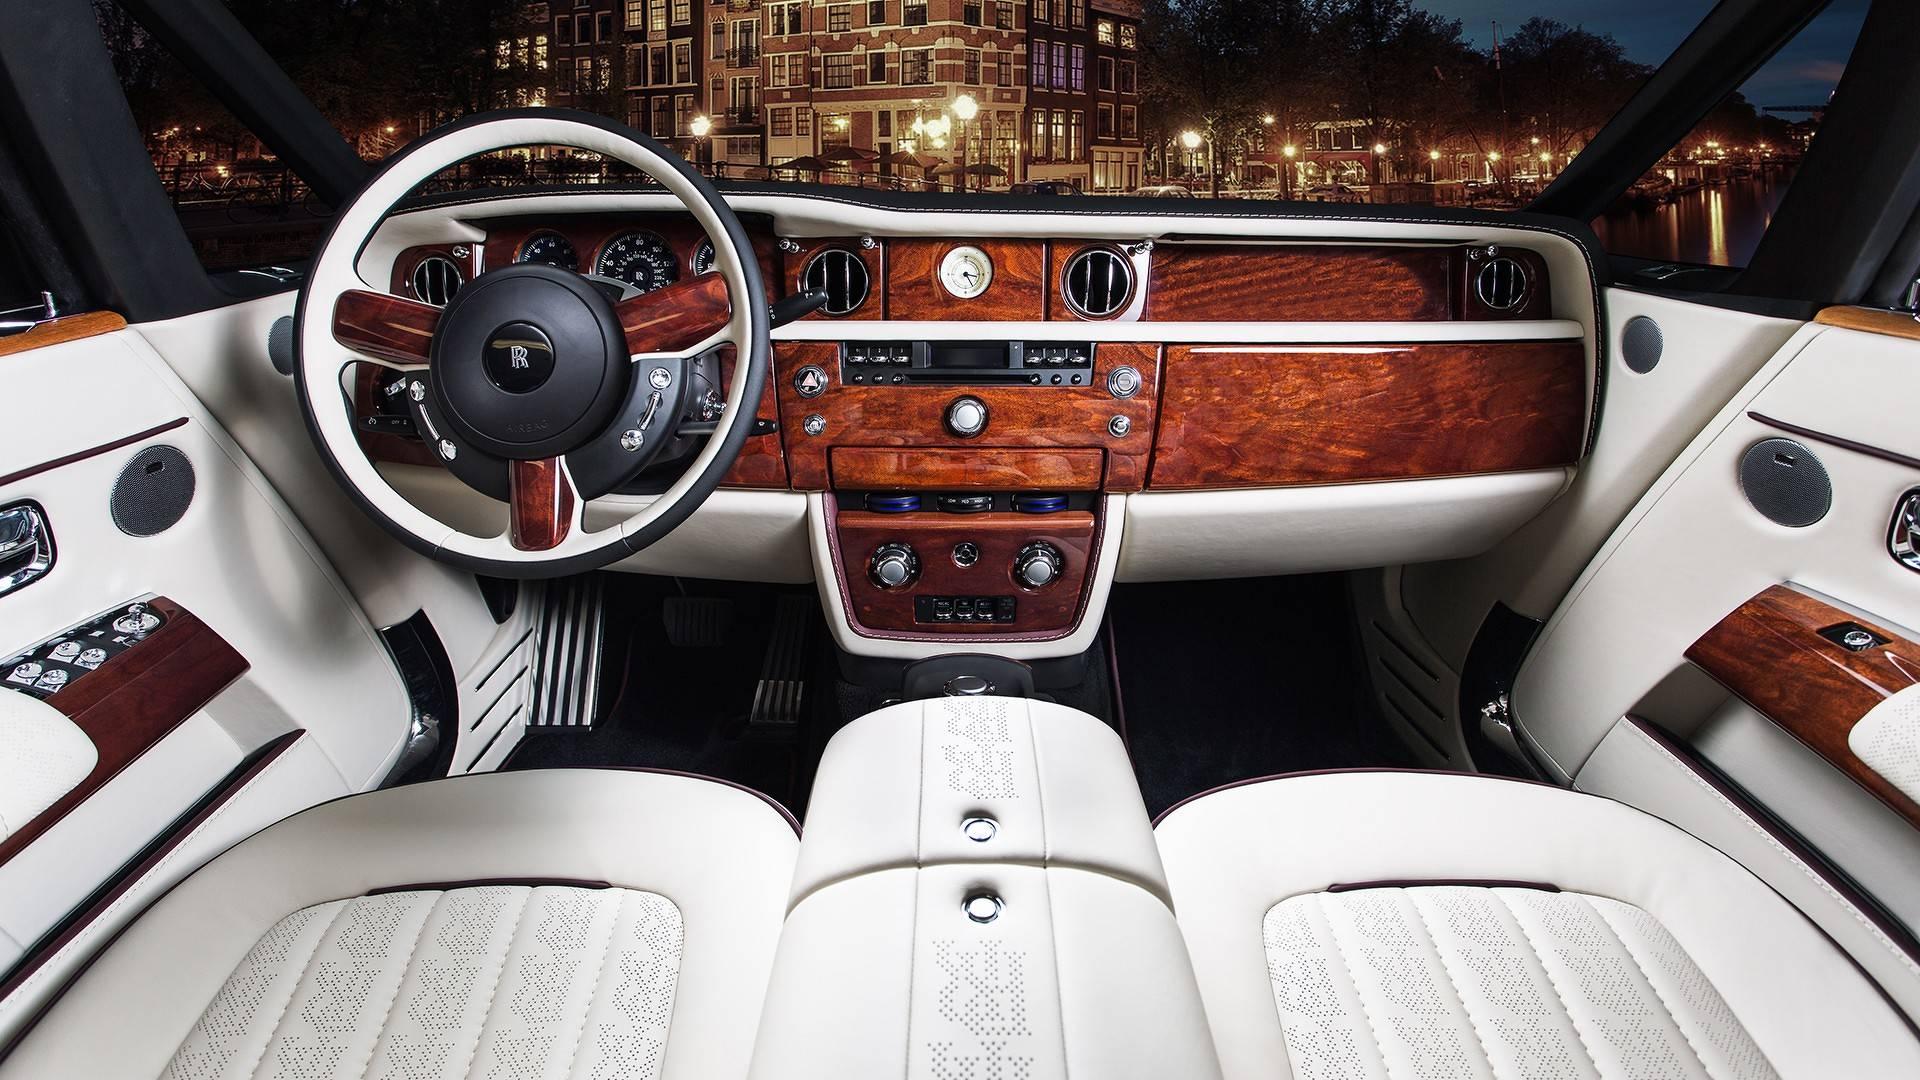 Rolls Royce Phantom Drophead Coupe By Vilner Is Truly Bespoke